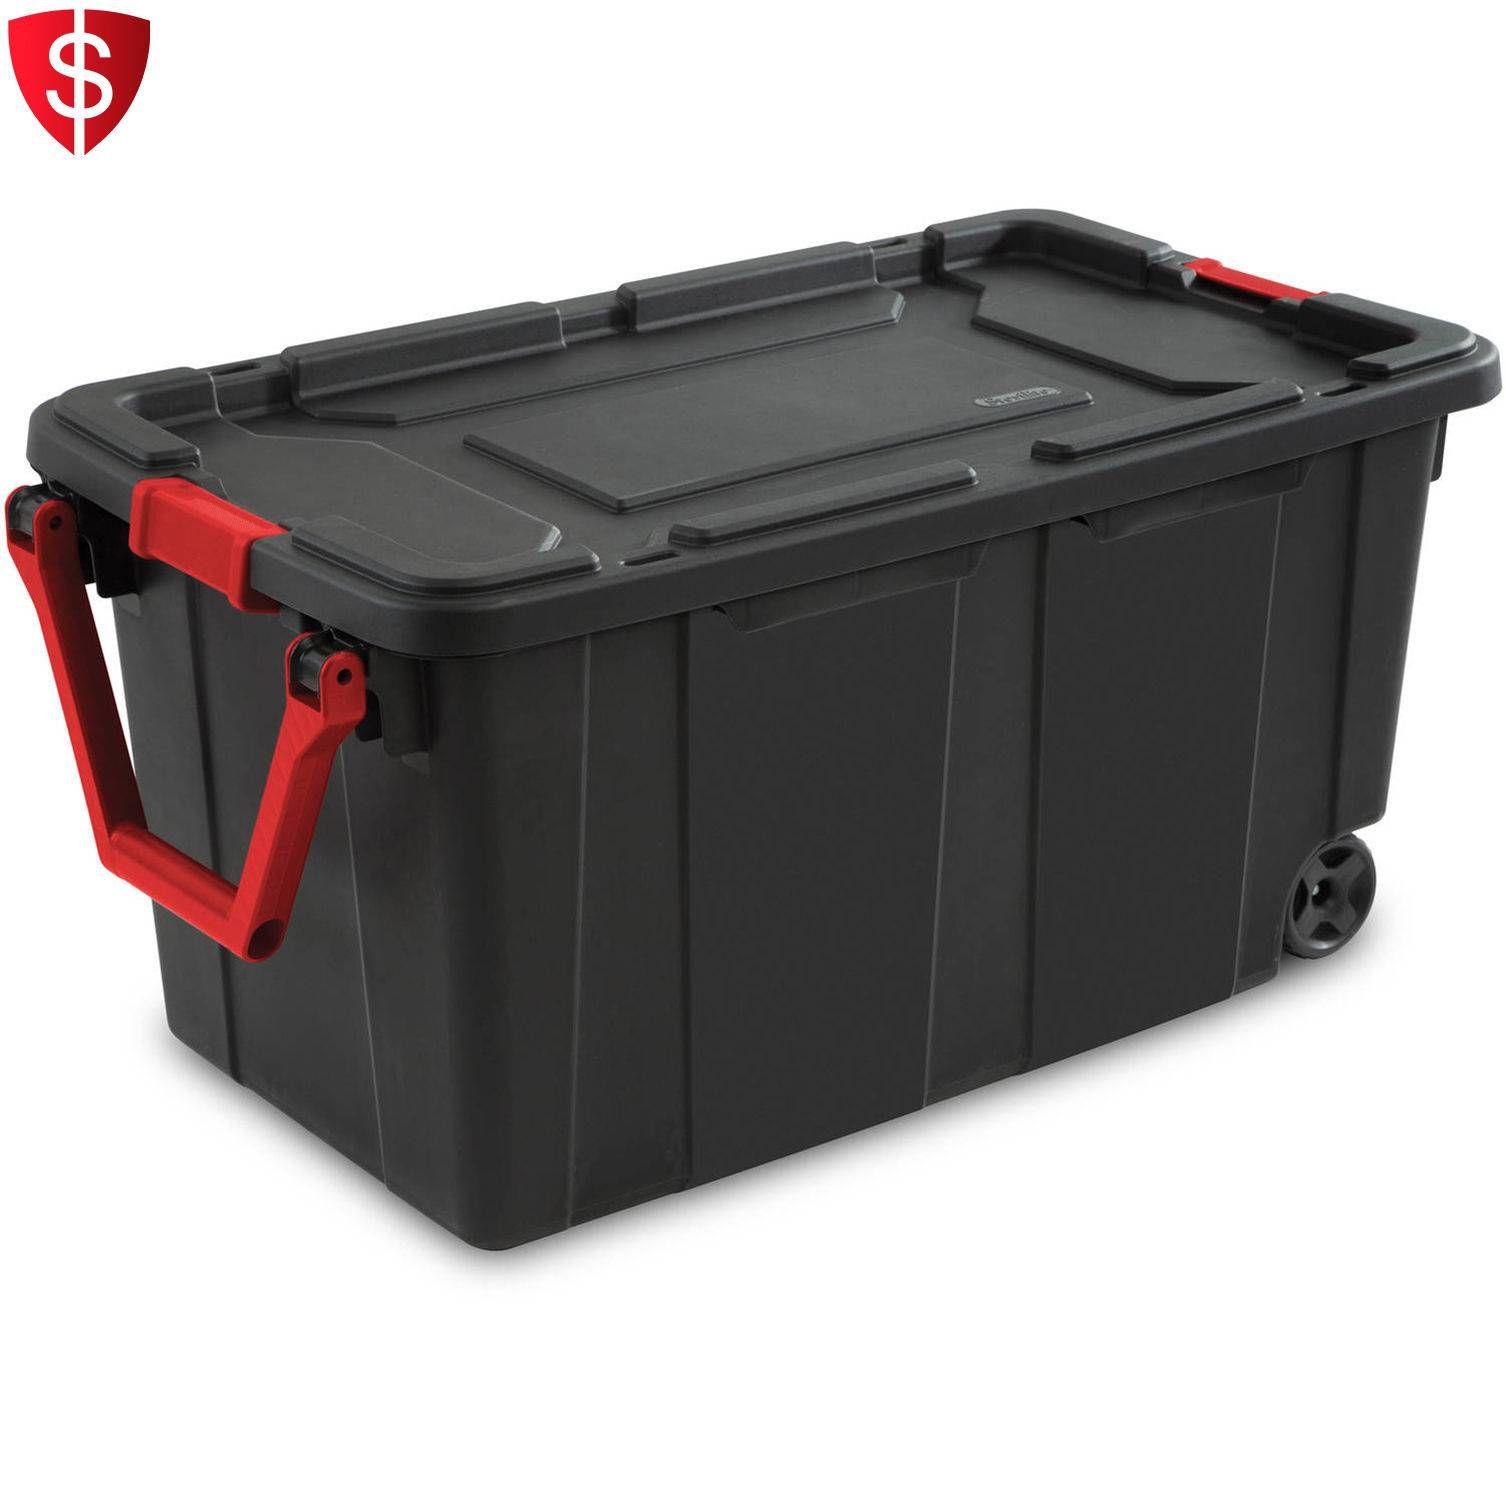 Cool Wheeled Storage Container Field Plastic Meals Bin Organizer Rolling Tote Organizer Check M Storage Bins With Wheels Large Storage Bins Plastic Box Storage